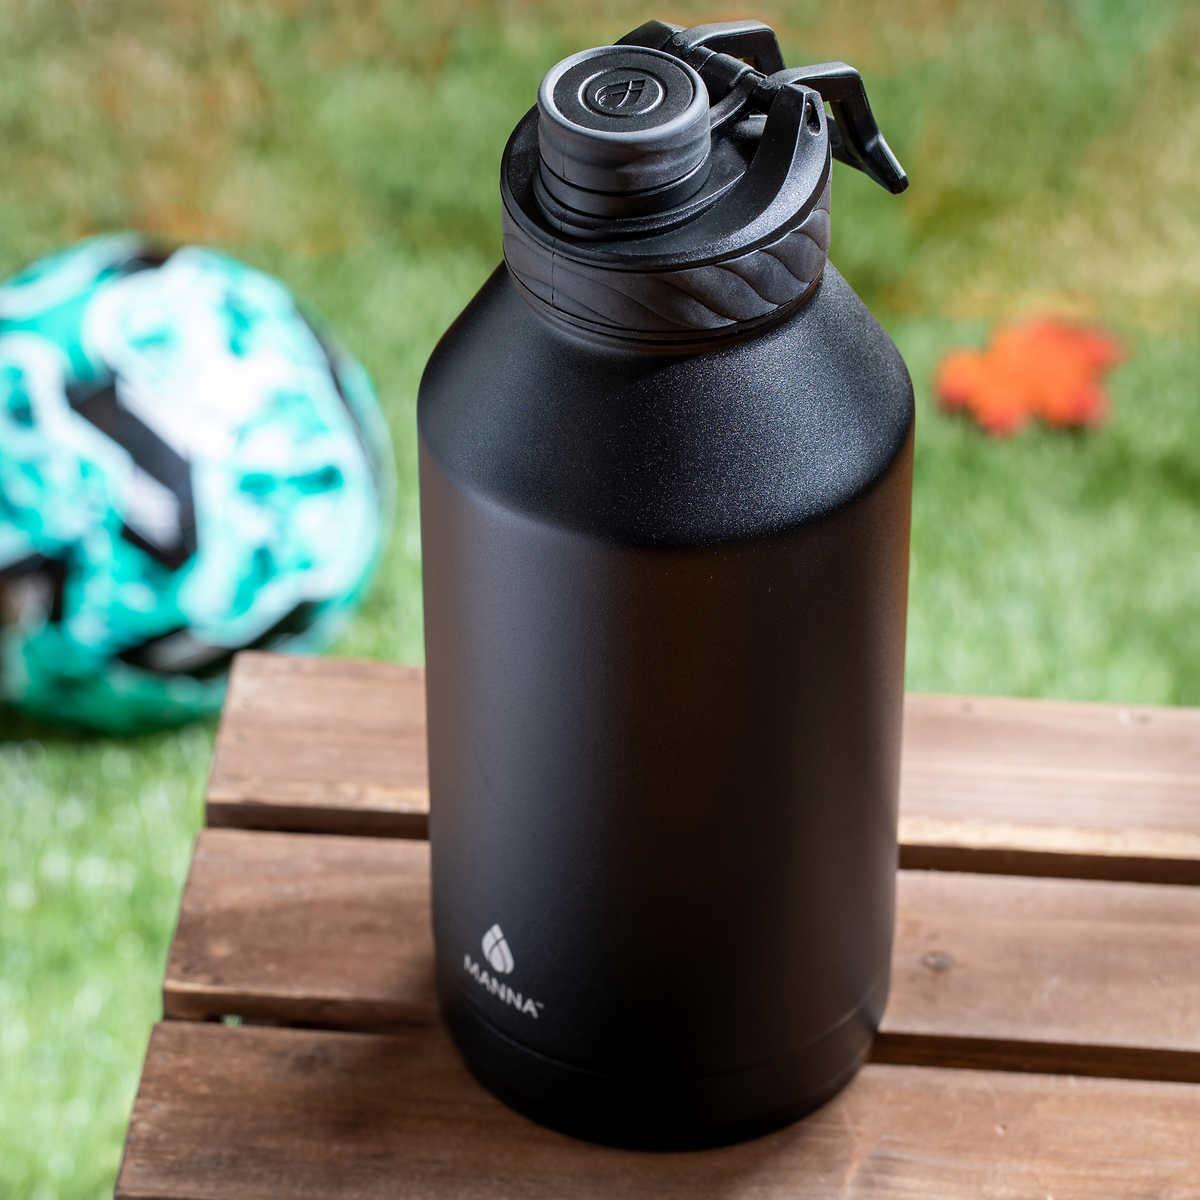 🔥 Manna Stainless Steel 64oz Water Bottle Black